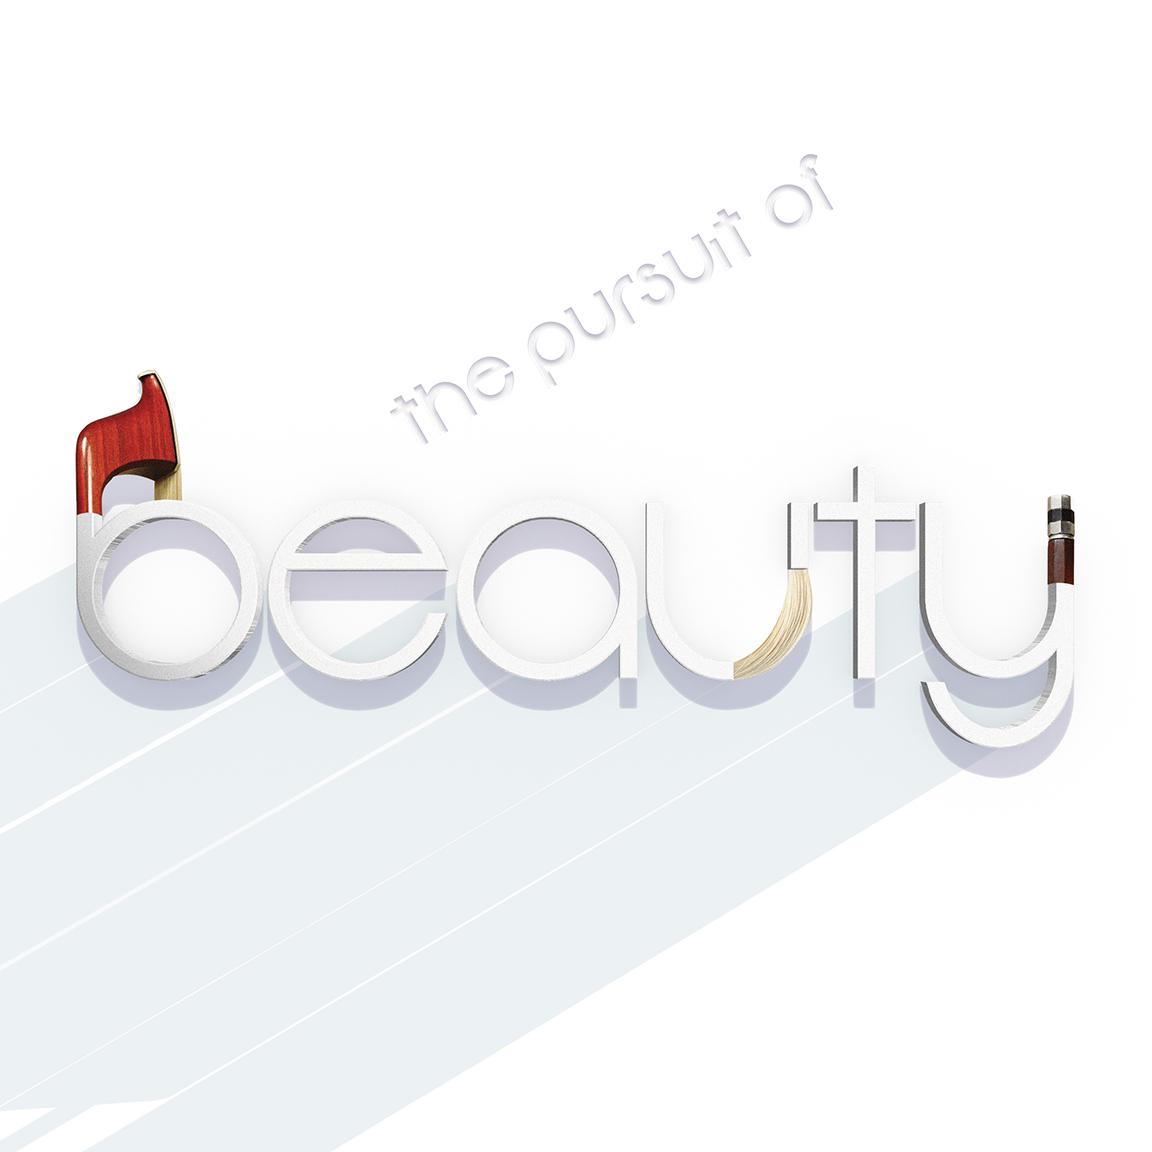 Beauty_96dpi.jpg